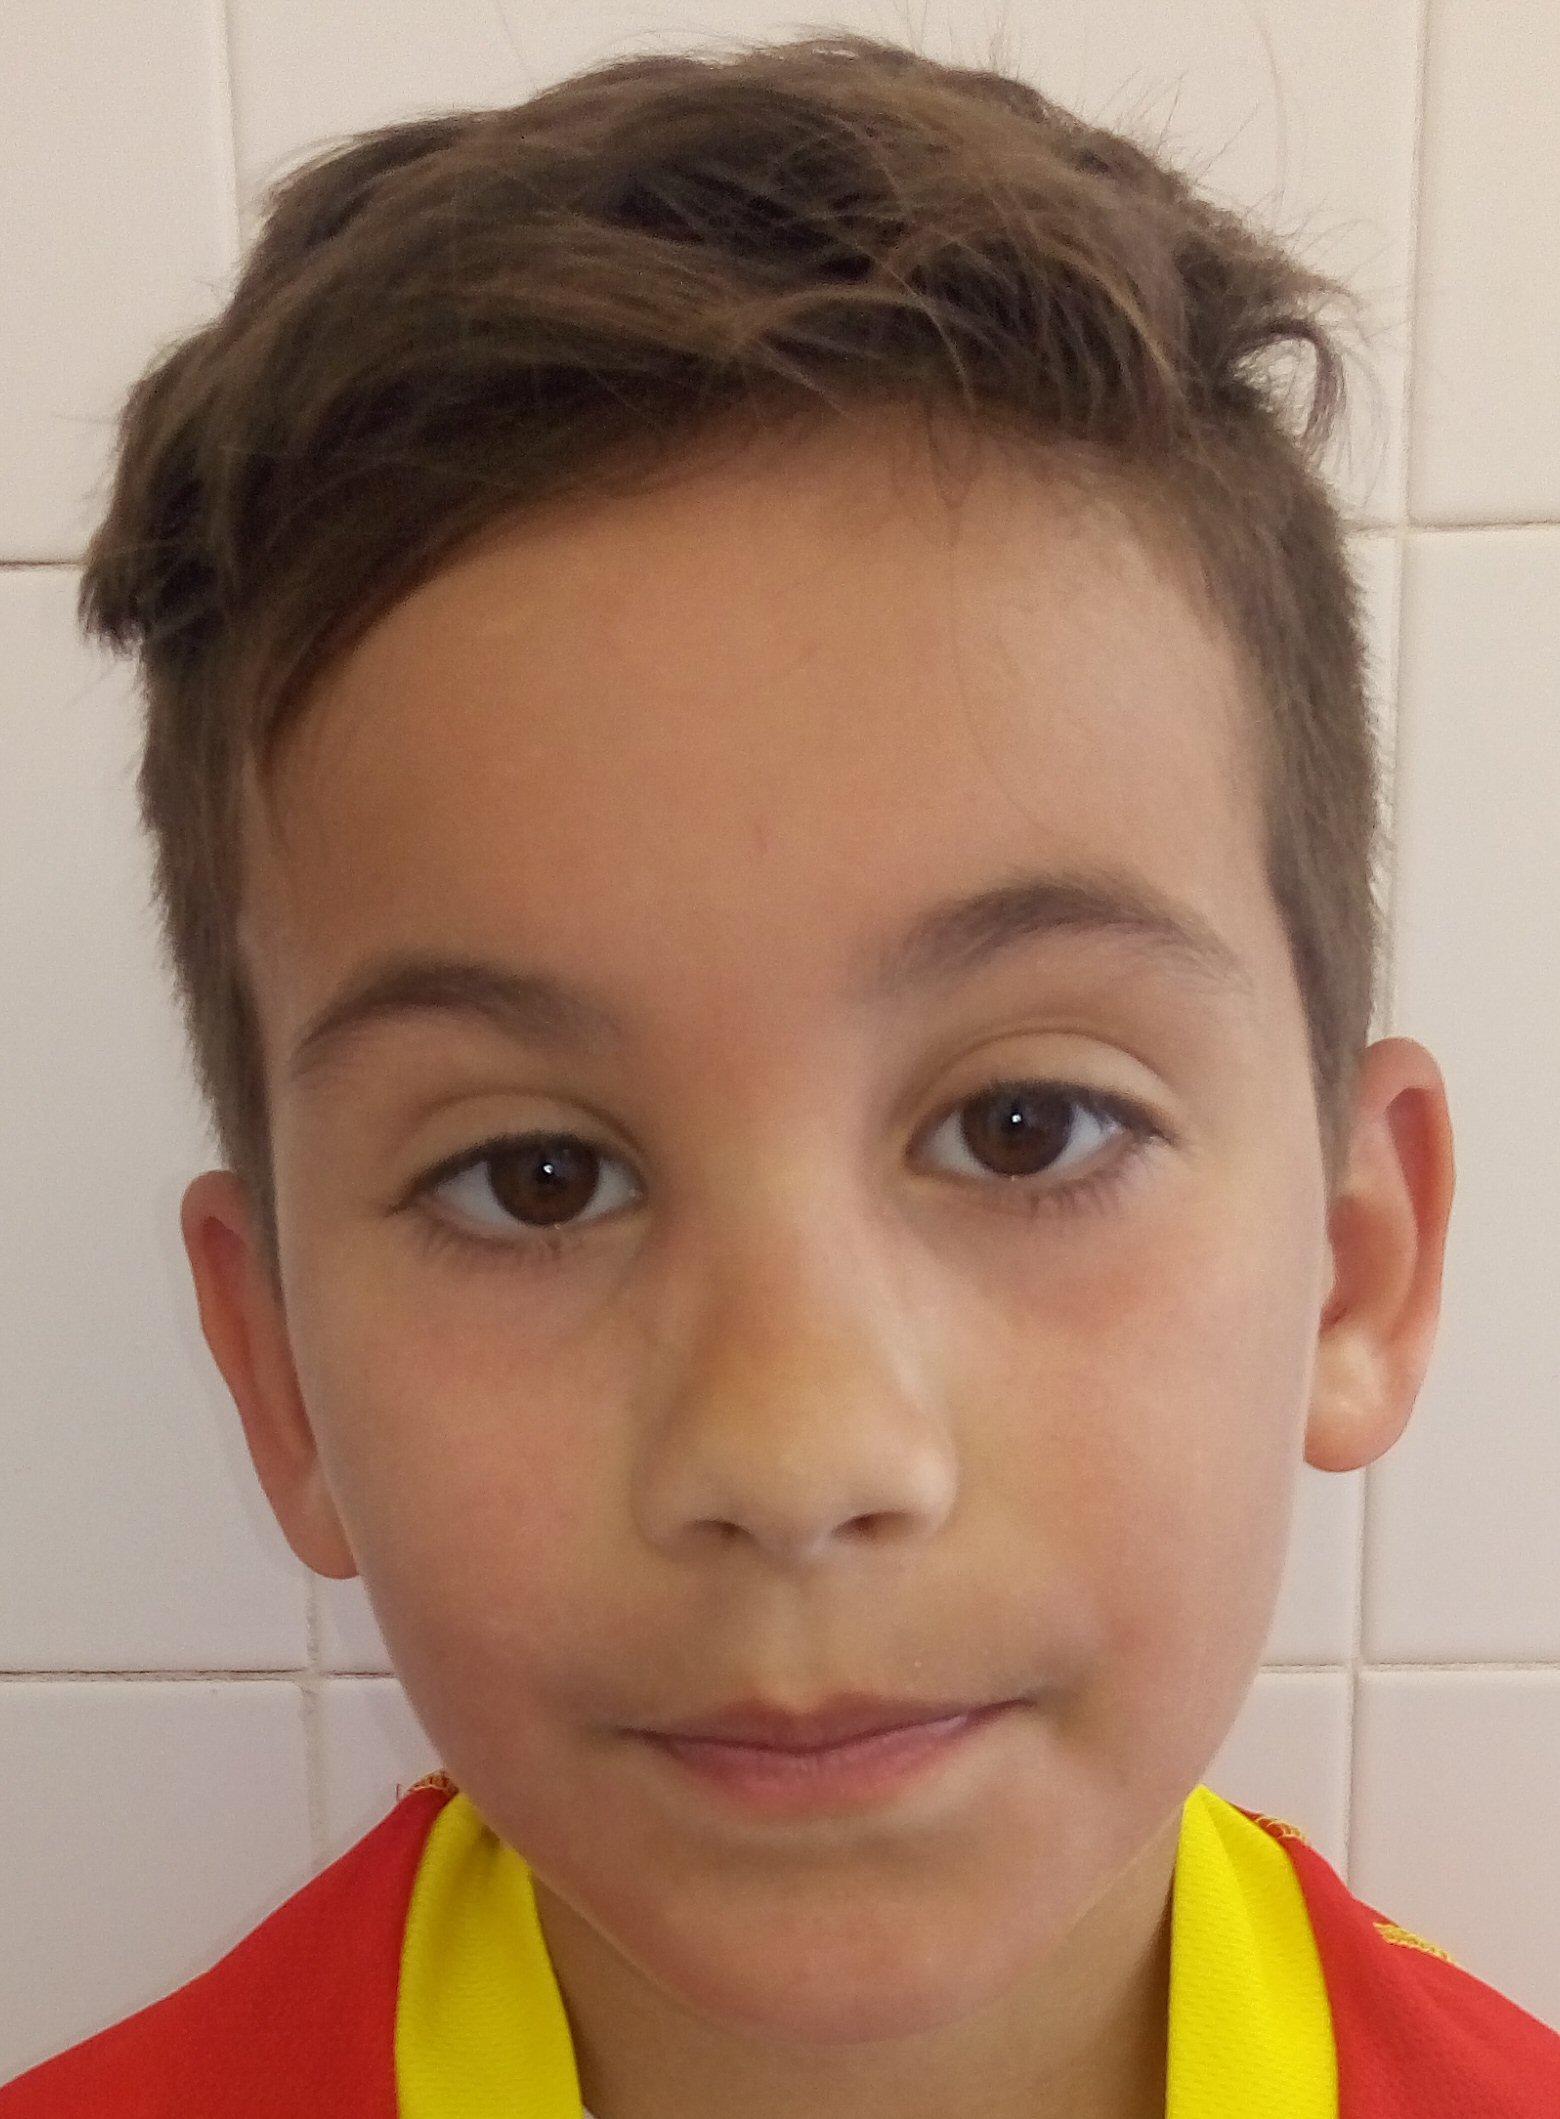 PEDRO MIGUEL OLIVEIRA DIAS